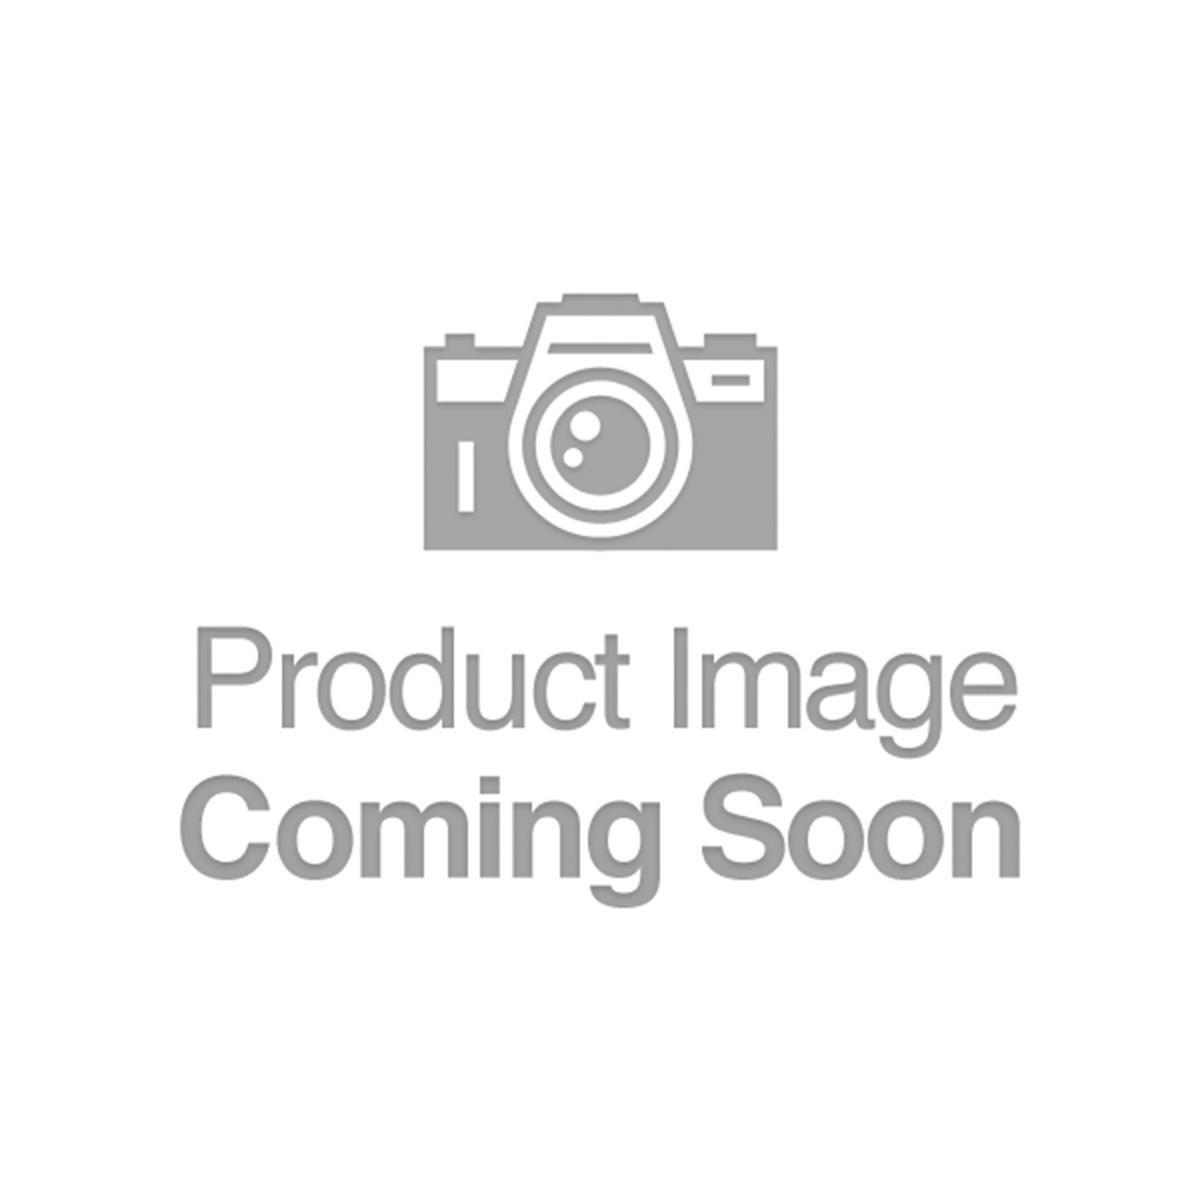 Mandan - North Dakota - CH 2585 - FR 634 - PMG 25